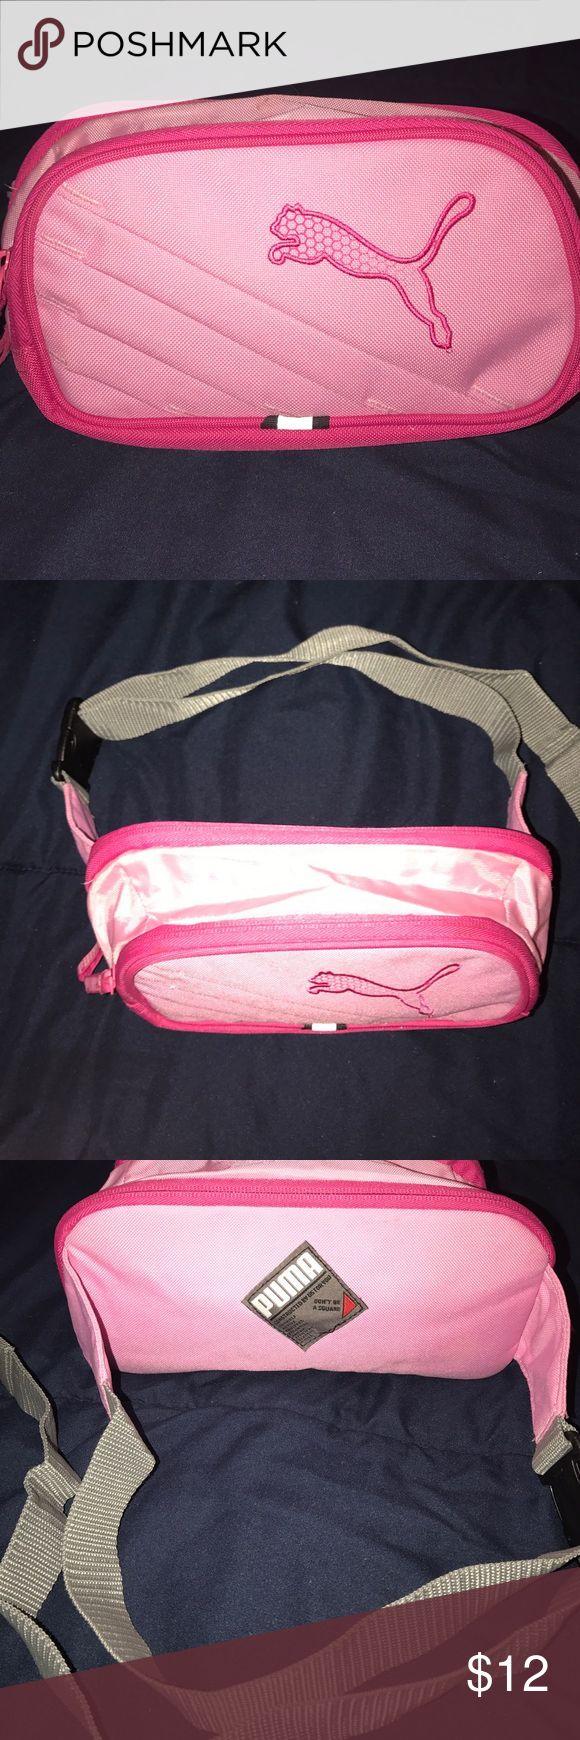 Pink Puma waist bag Pink puma sport waist bag with adjustable belt and snap. Puma Bags Travel Bags